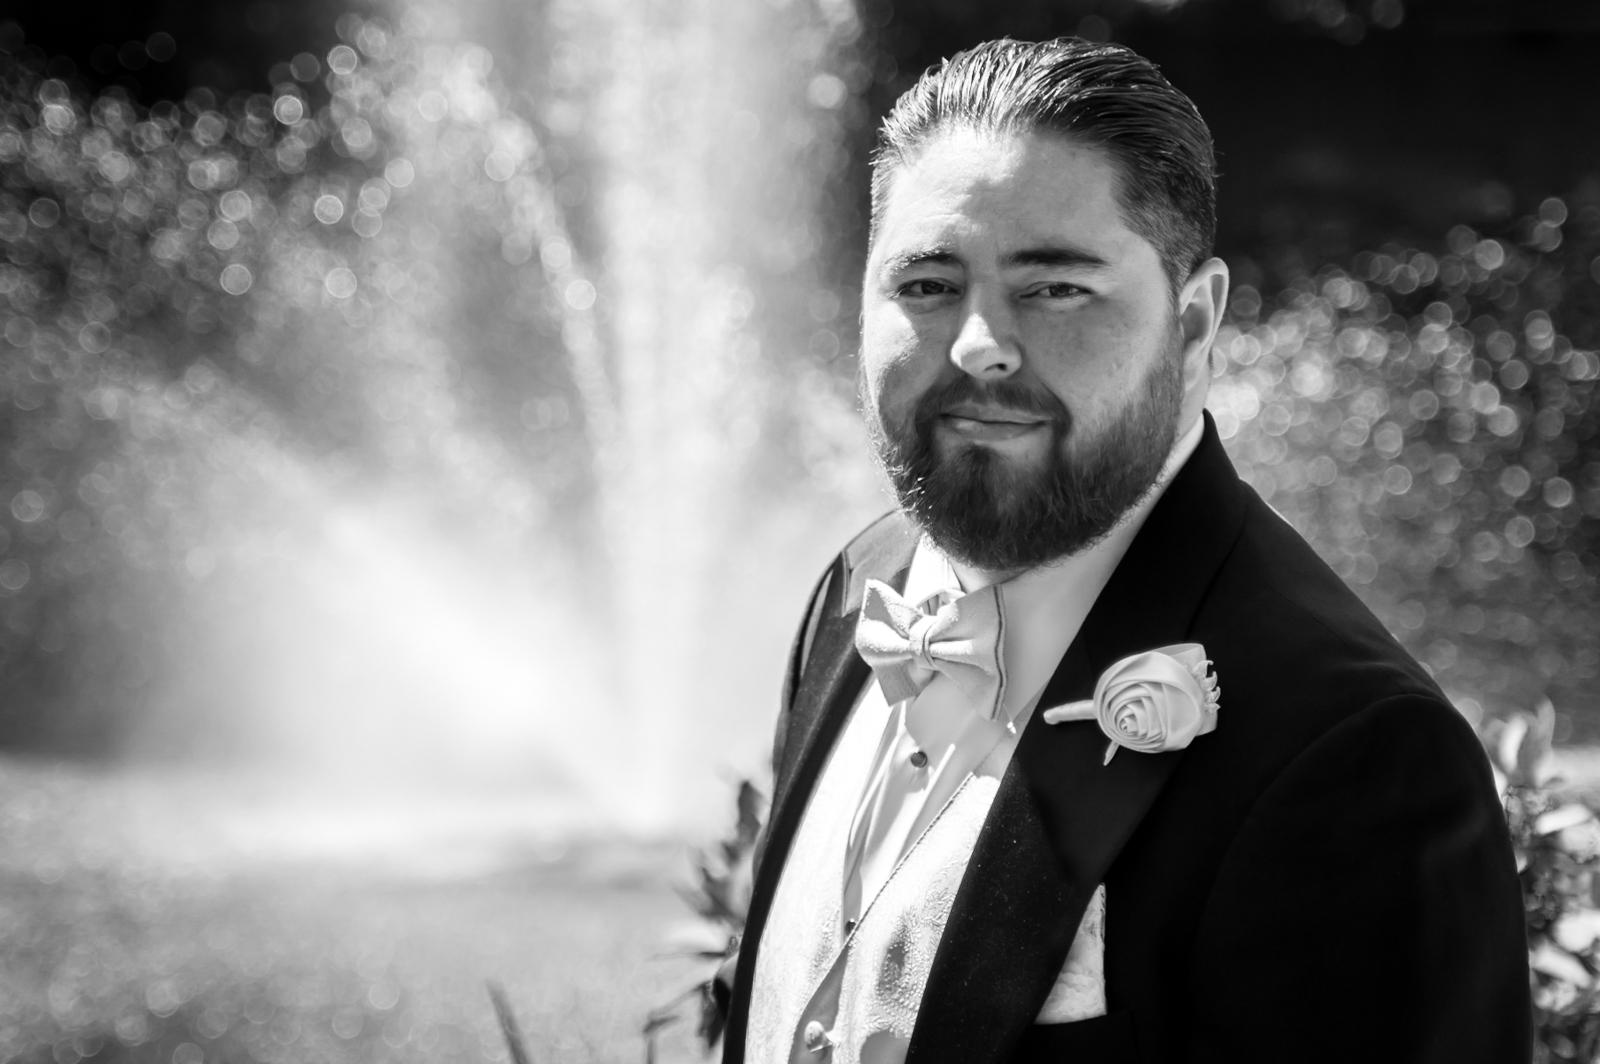 wedding-photography-portland-oregon-beaverton-elks-lodge